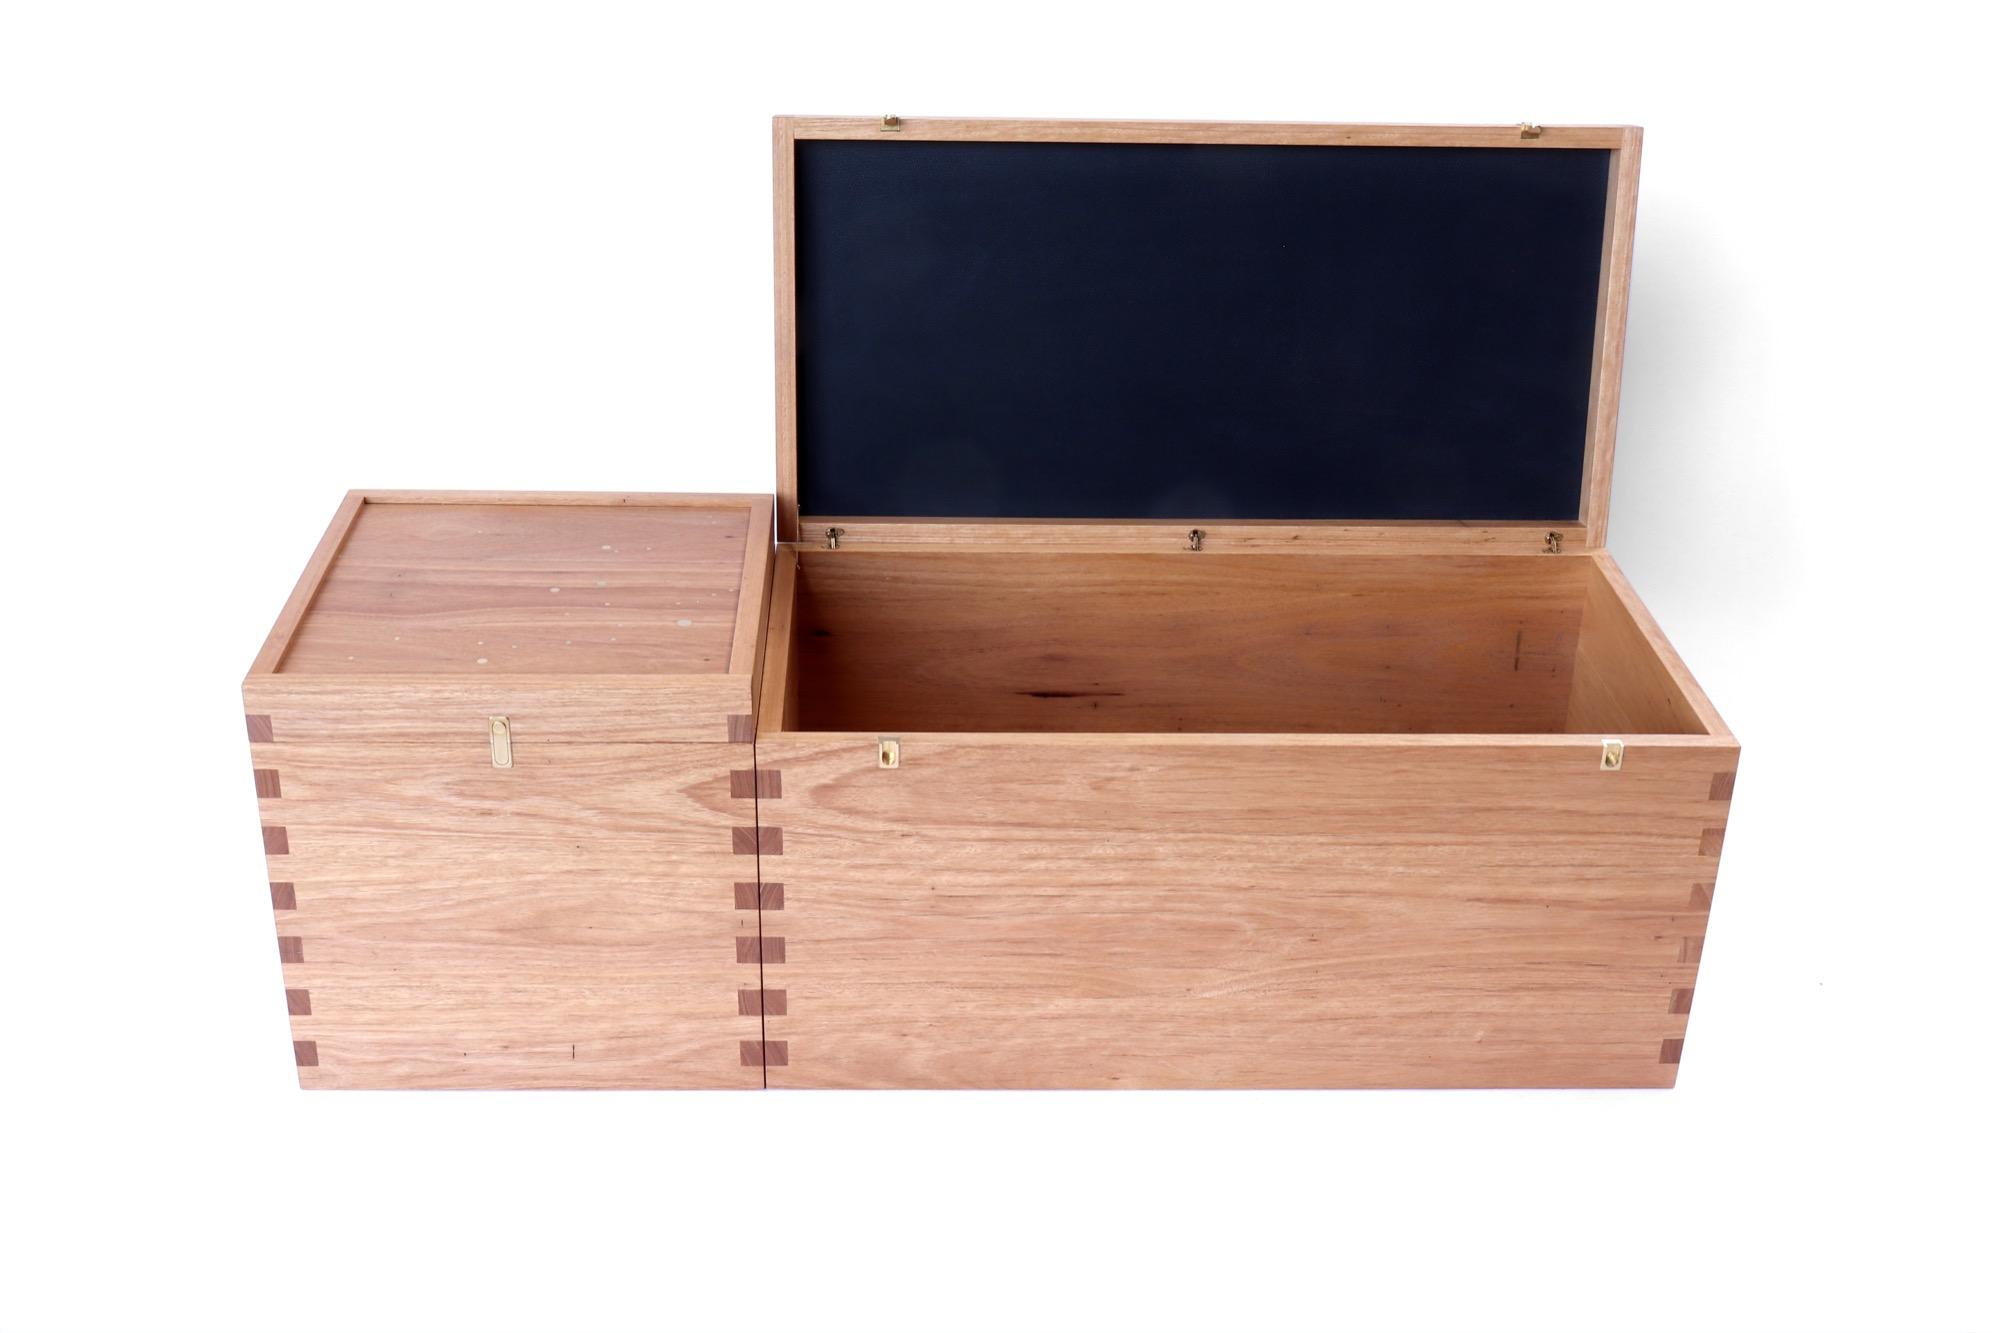 Star Boxes by Sawdust Bureau 2000 res_08